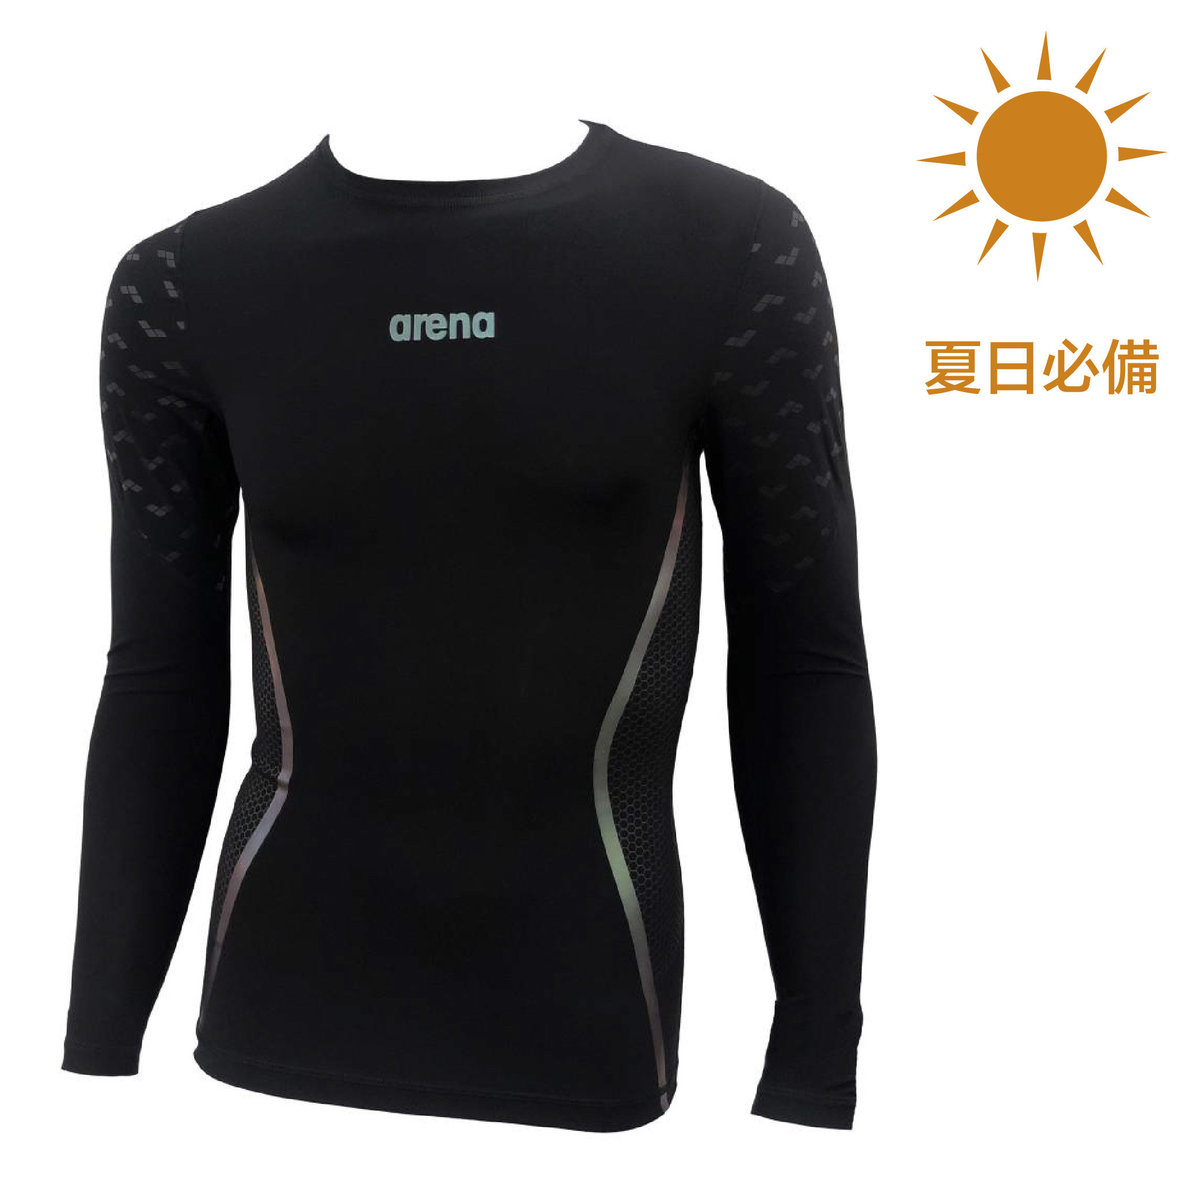 SWIMWEAR Men's MOTION-X ENERGY LONG SLEEVE SUN PROTECTION UV PROTECTION TOP